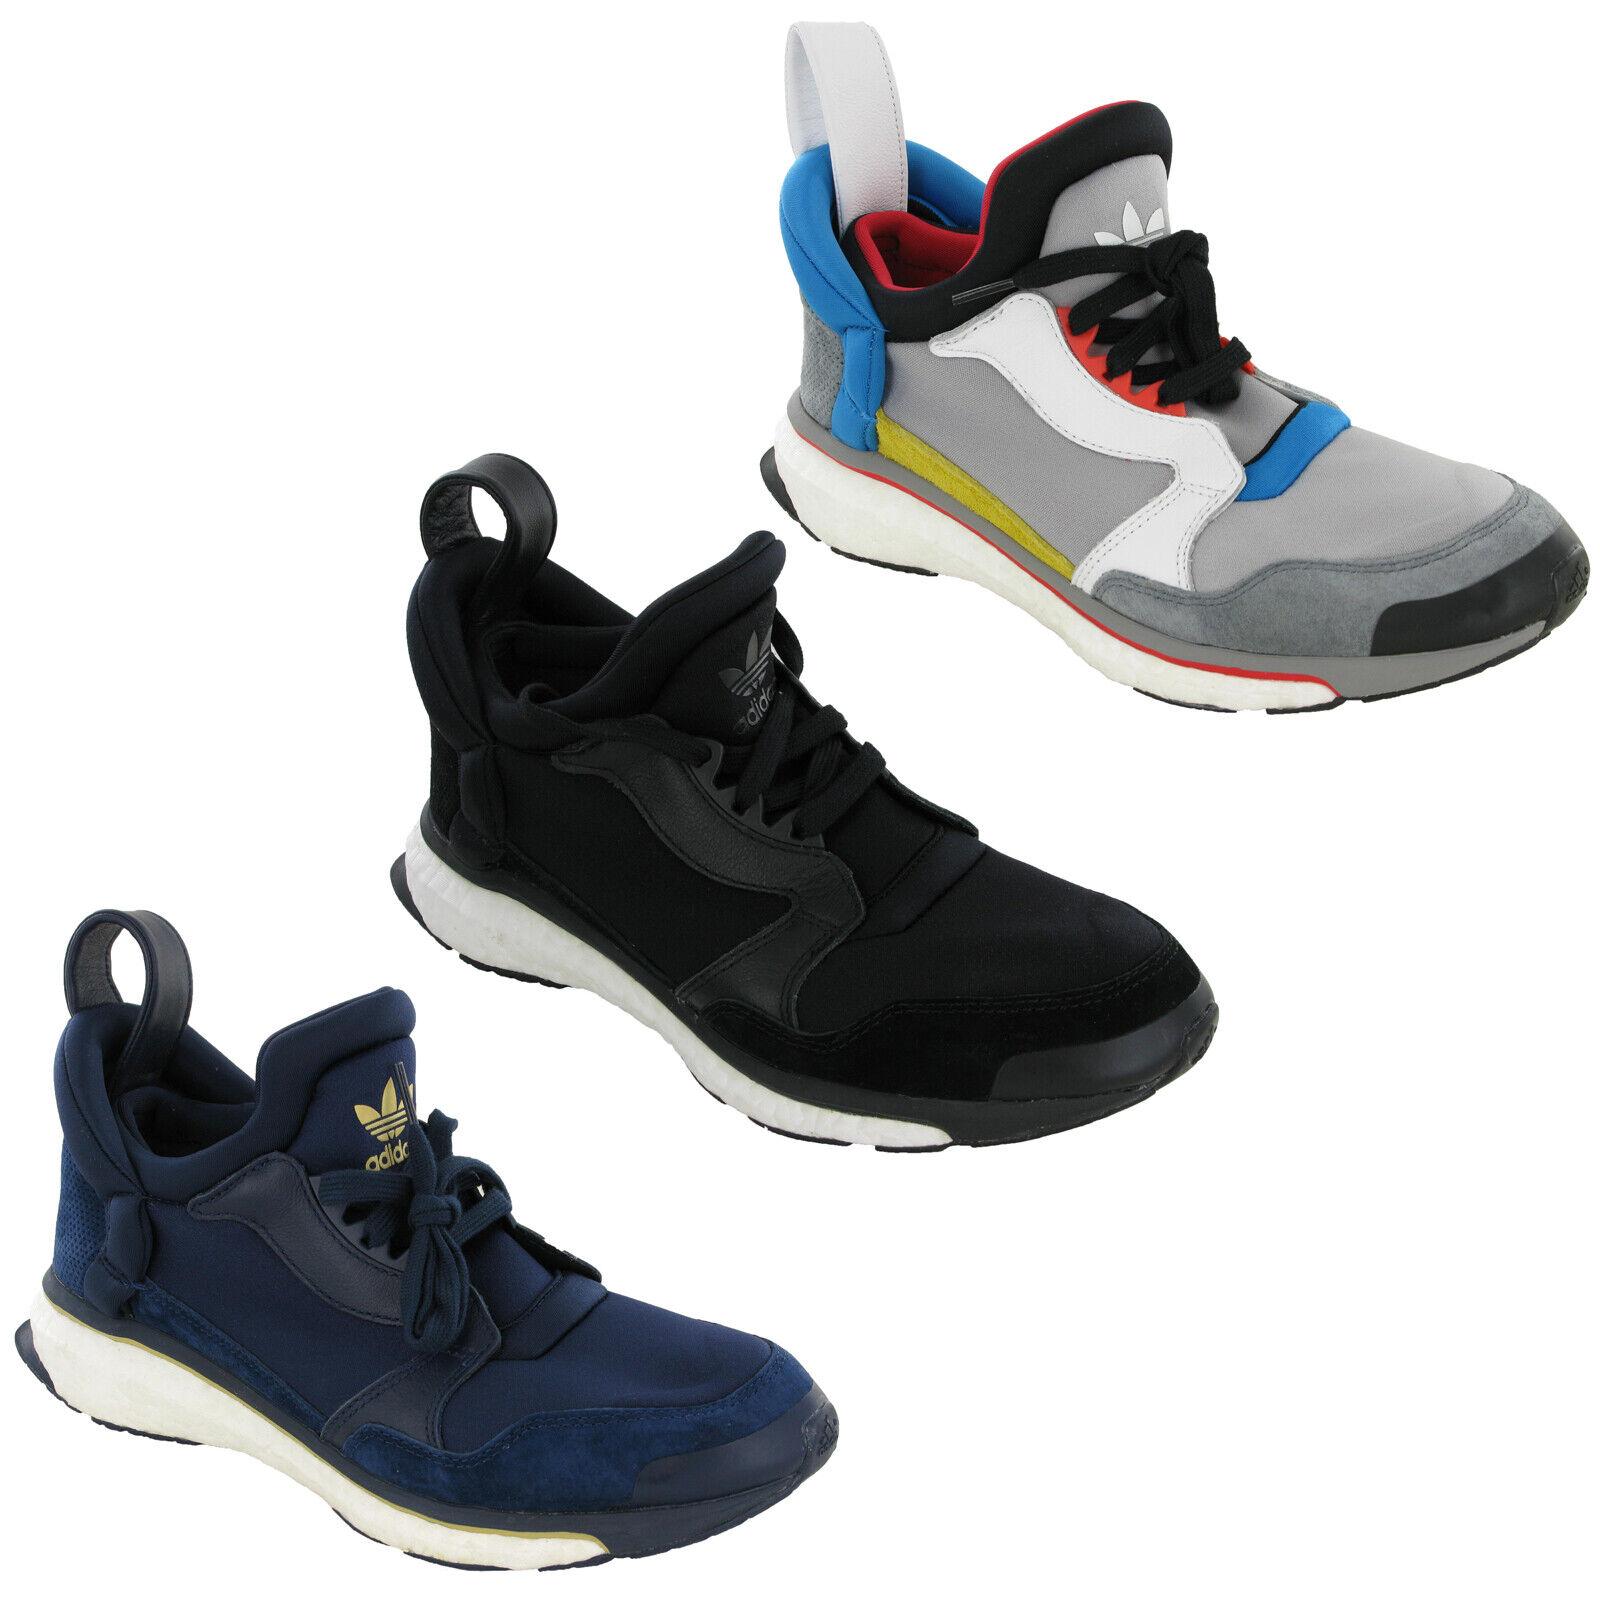 Adidas Neo VS Jog Aw4702 eu 42 23 UK 8.5 Hommes Chaussures